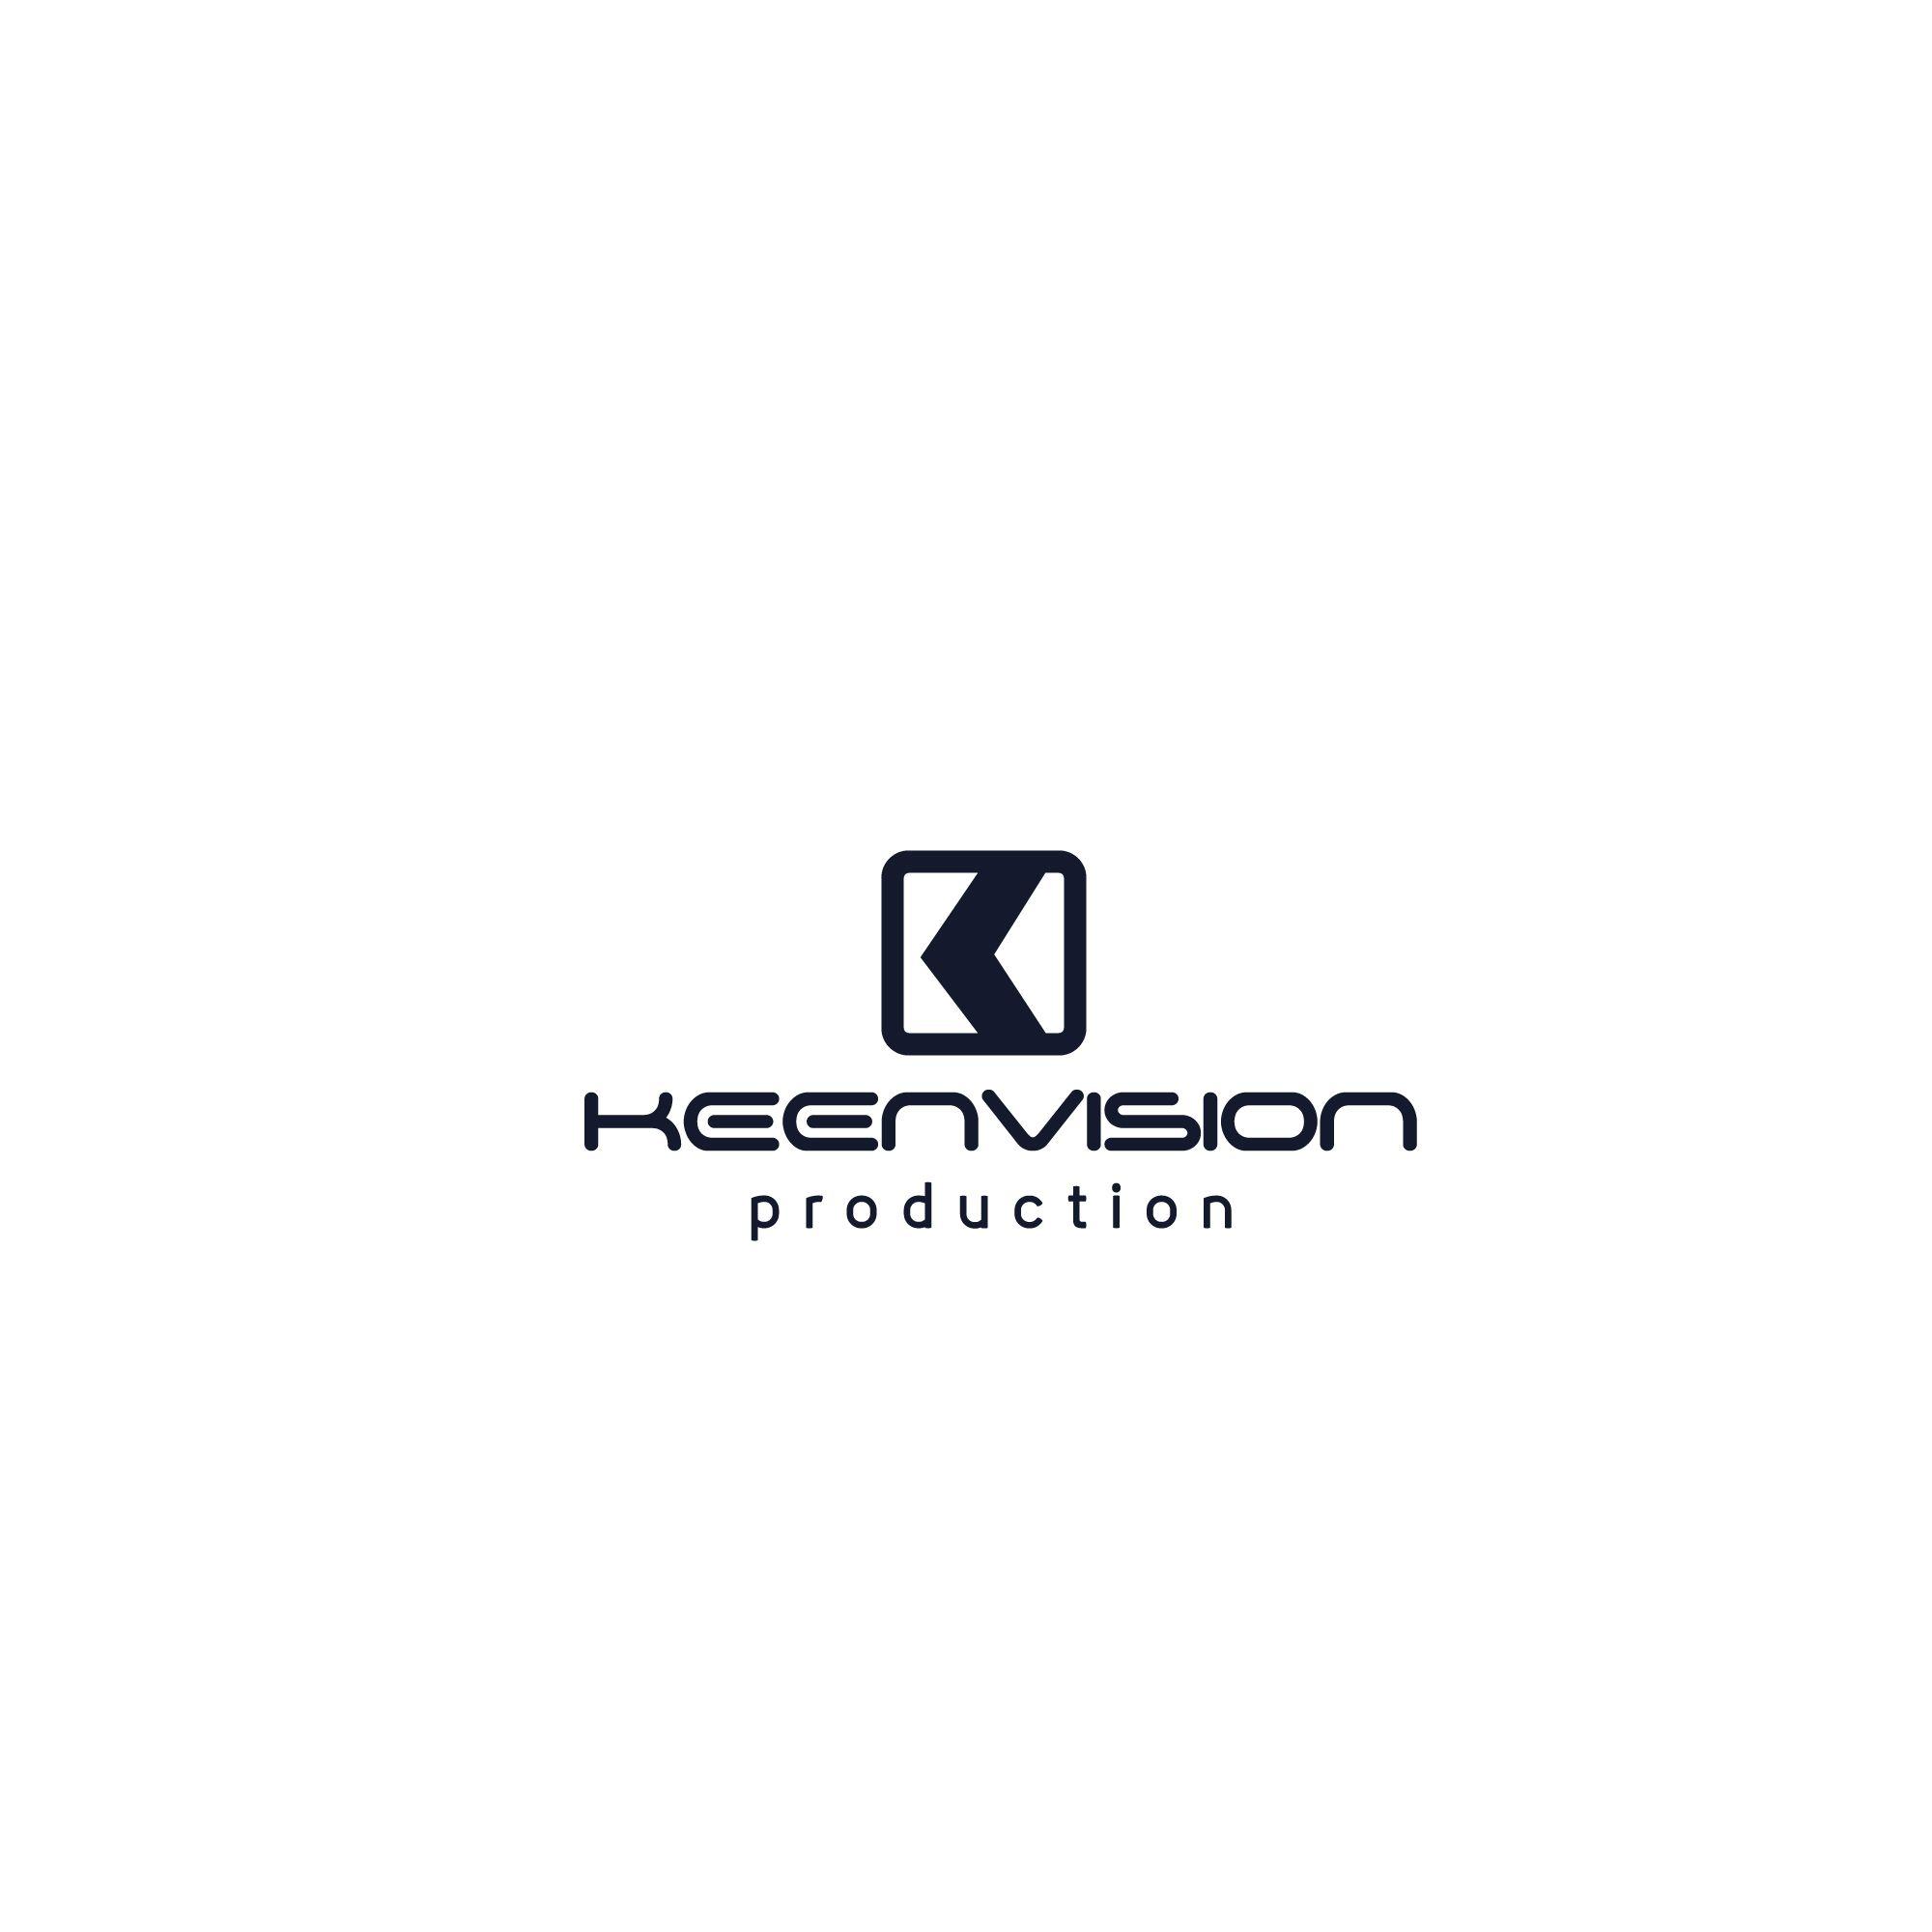 Логотип для KeenVision - дизайнер SmolinDenis